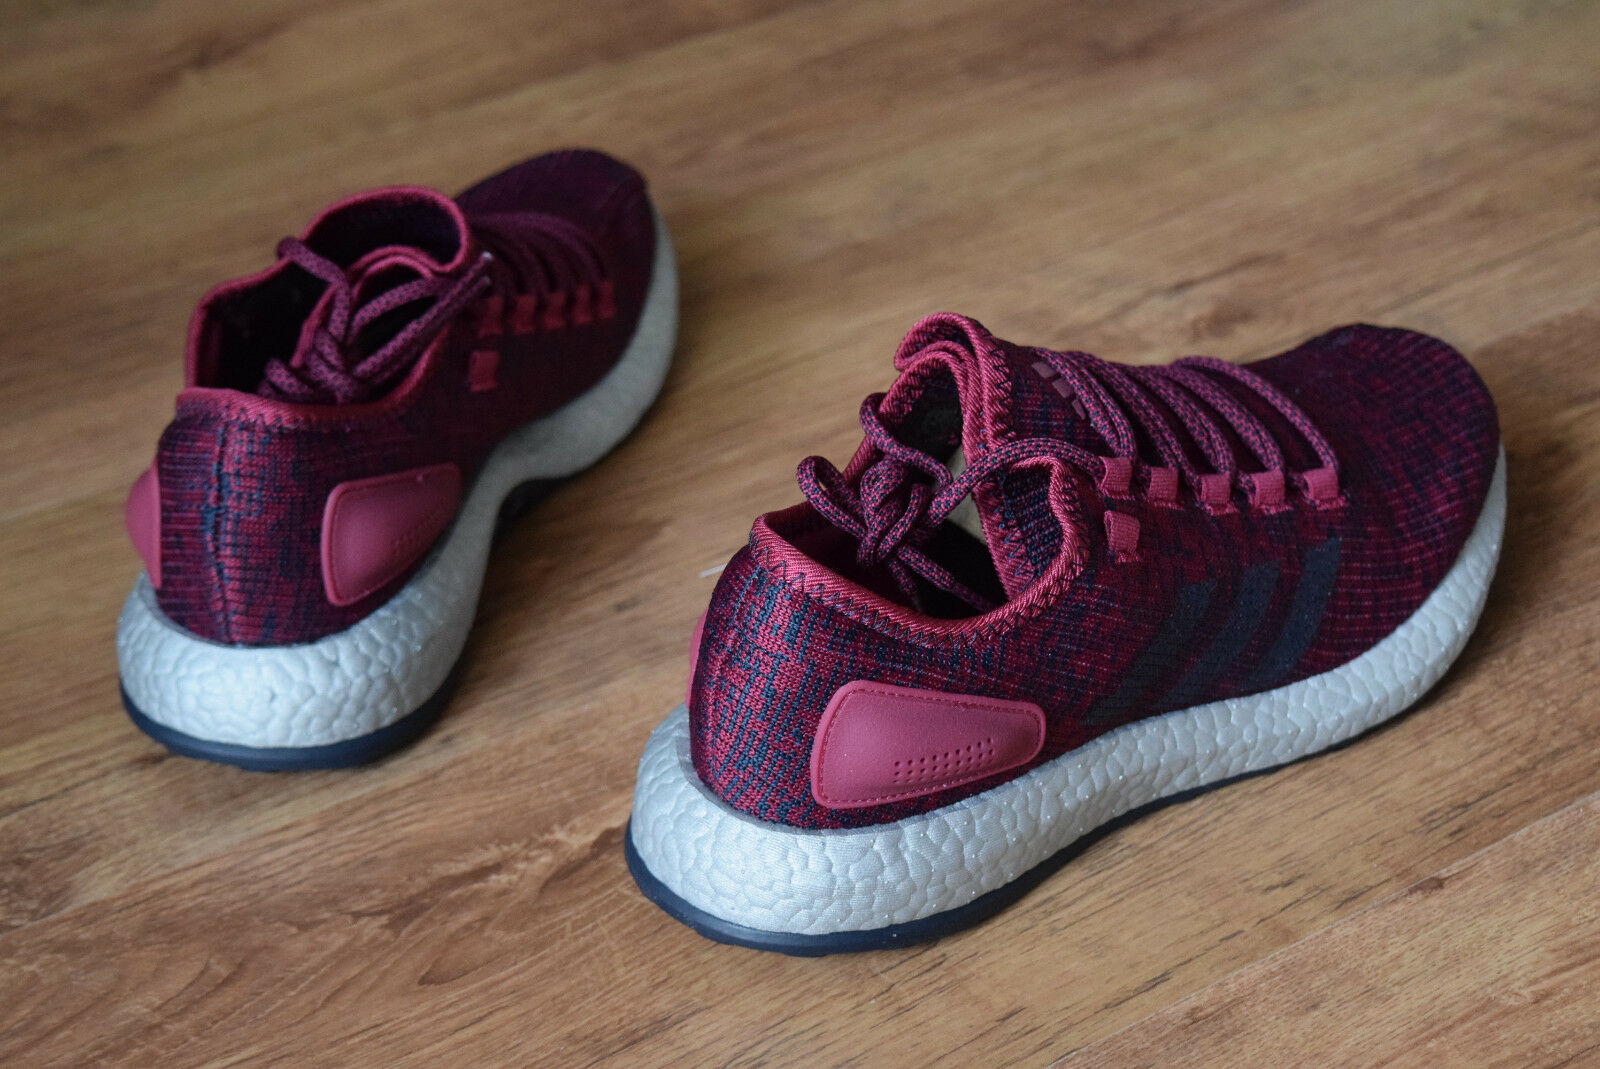 Adidas boost PureBoost 42 43 pure CG2987 ultra boost Adidas cOnSorTium nmd r1 yeezy 223b20